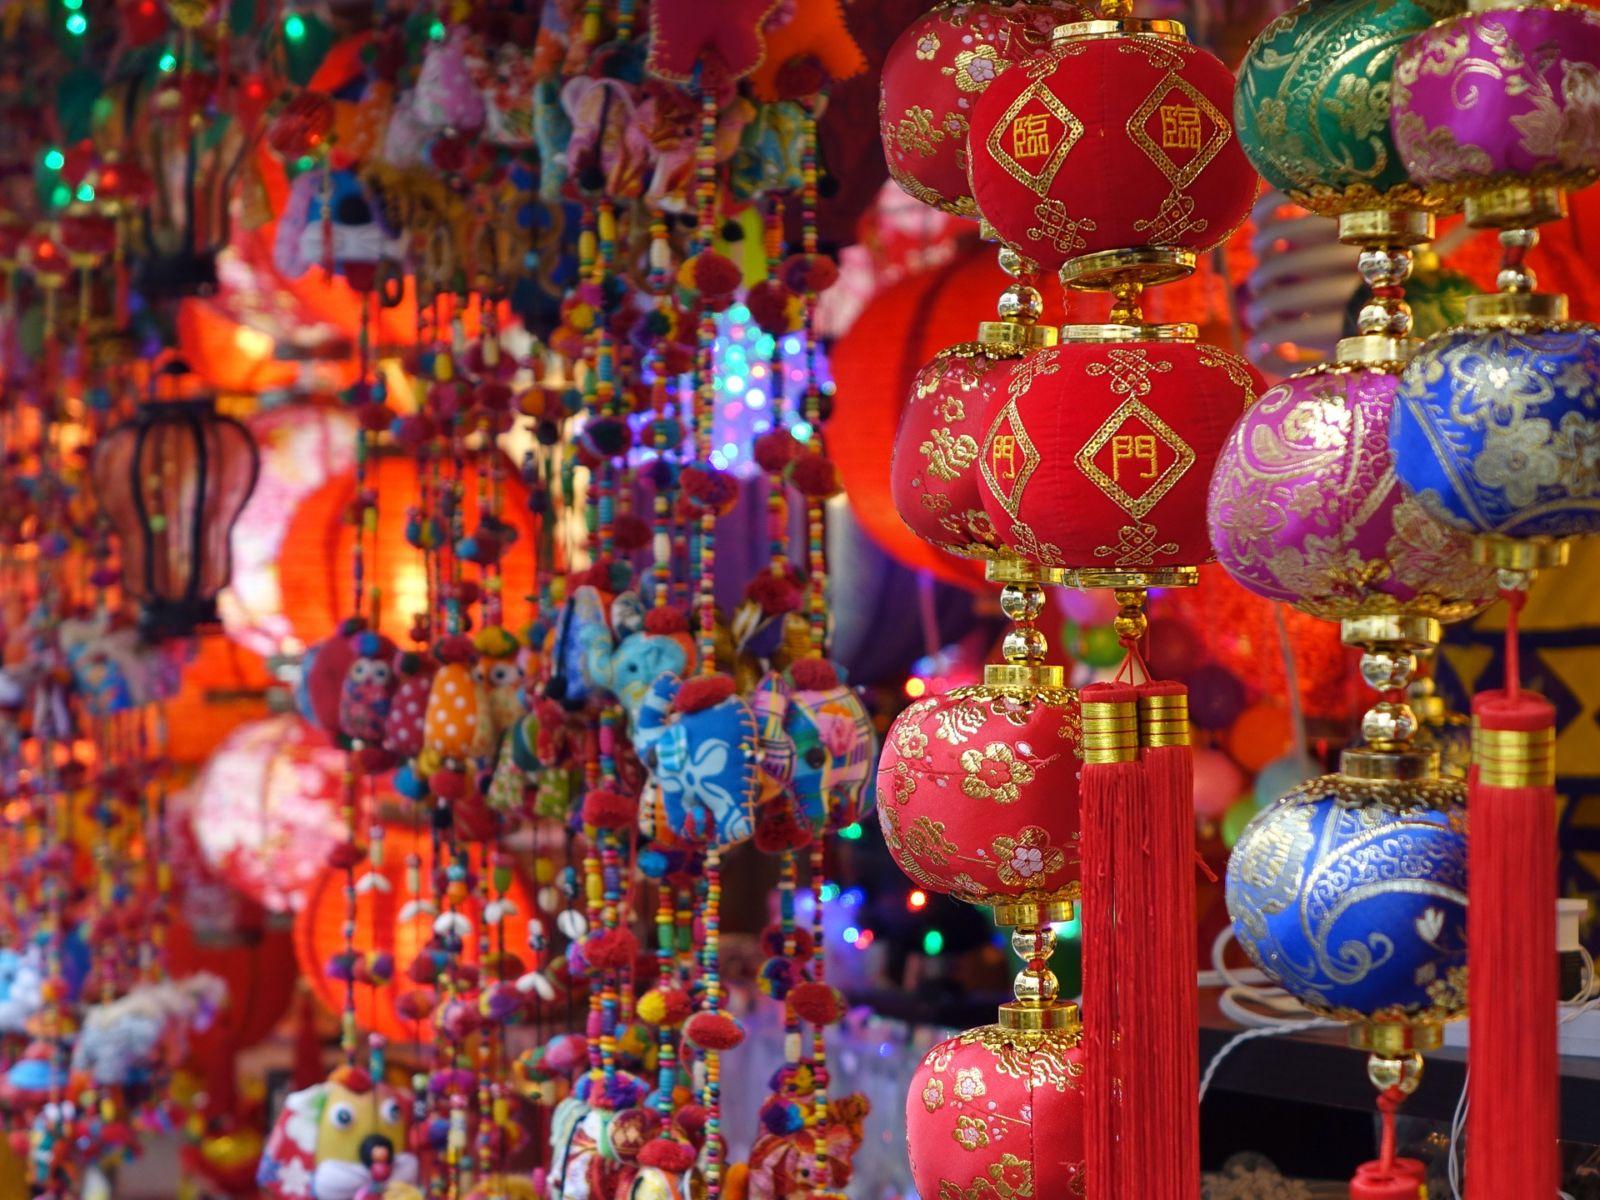 Chinese astrologie als levenswijze